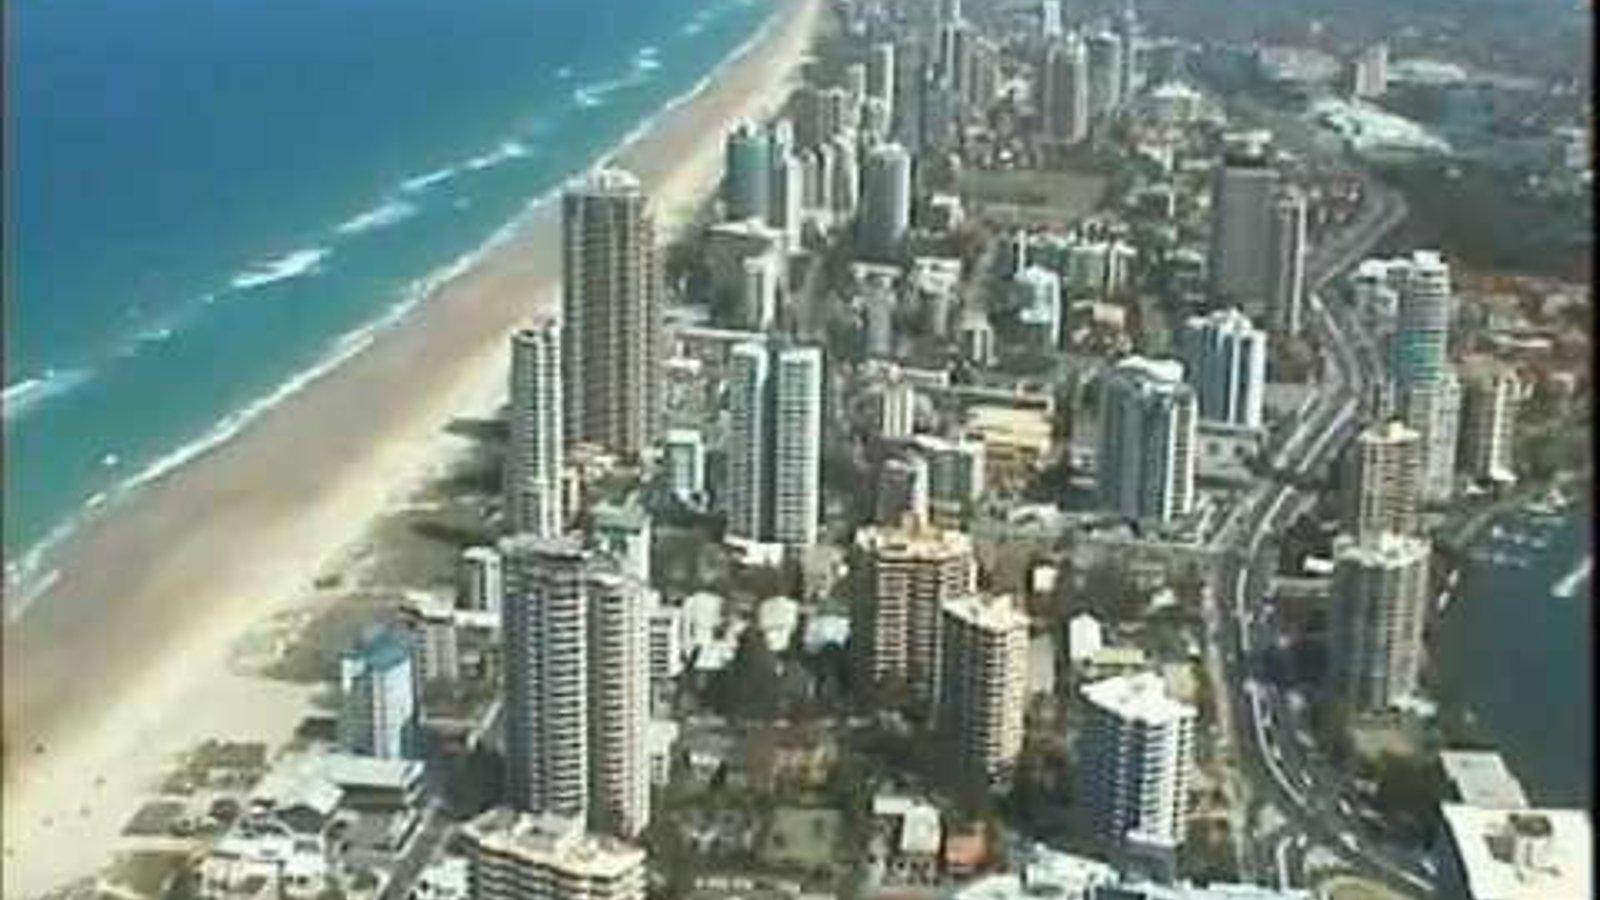 South East Queensland - Australia's Fastest Growing Region